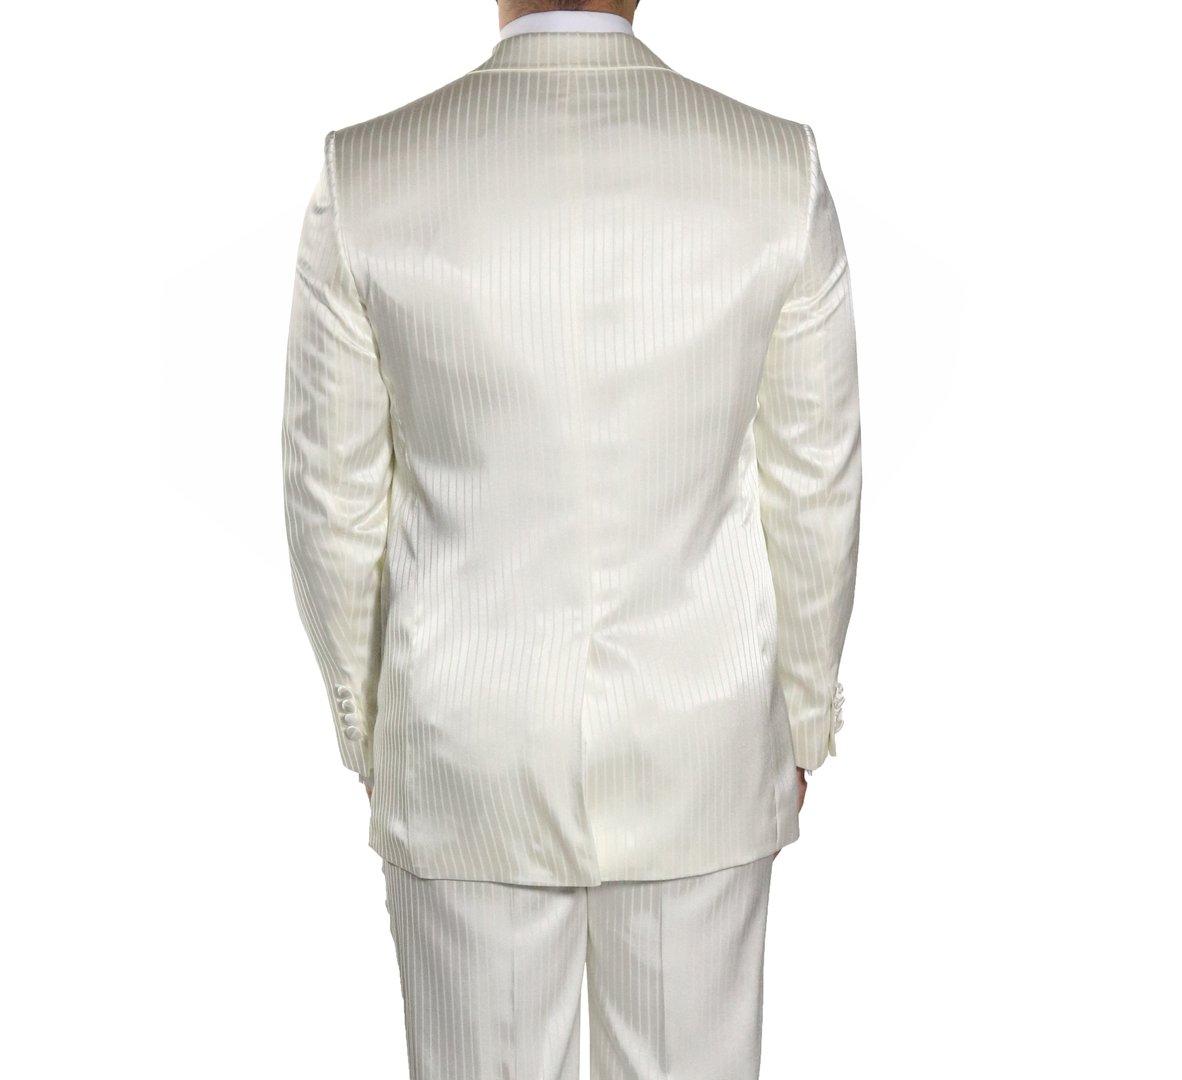 Muga Glanz Hochzeitsanzug Herrenausstatter